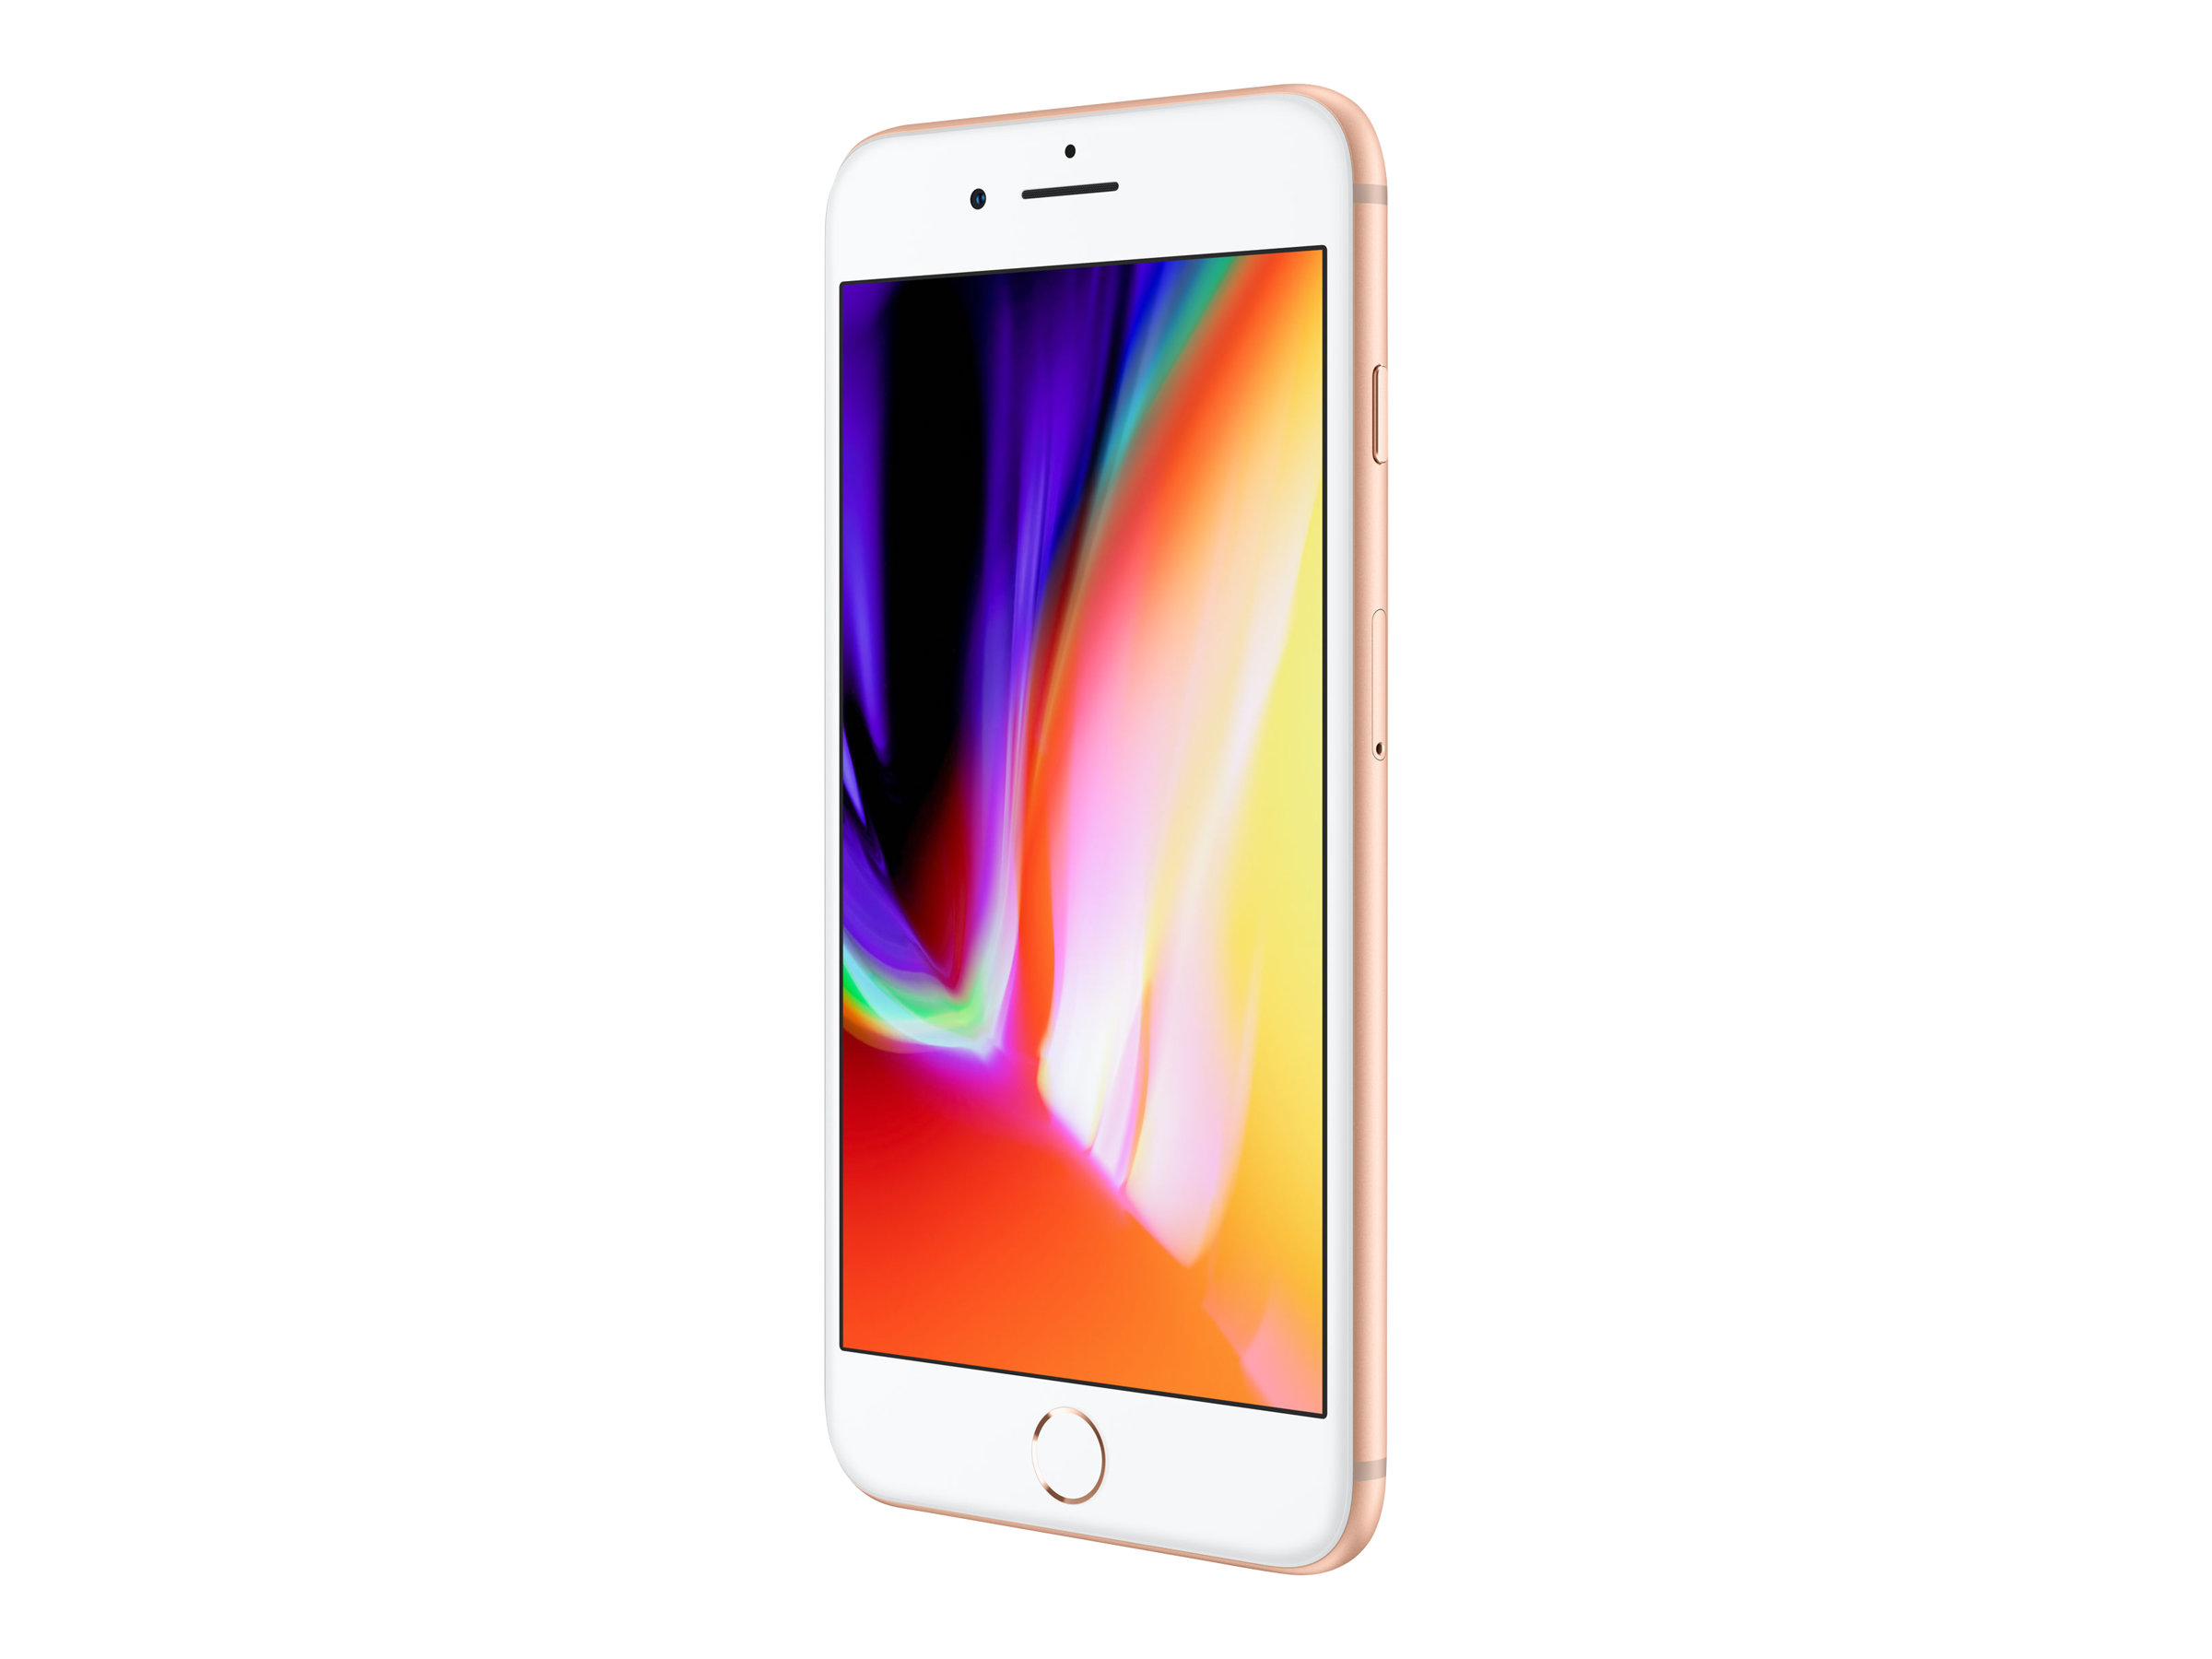 Apple iPhone 8 64GB GSM/CDMA Unlocked Phone - Gold